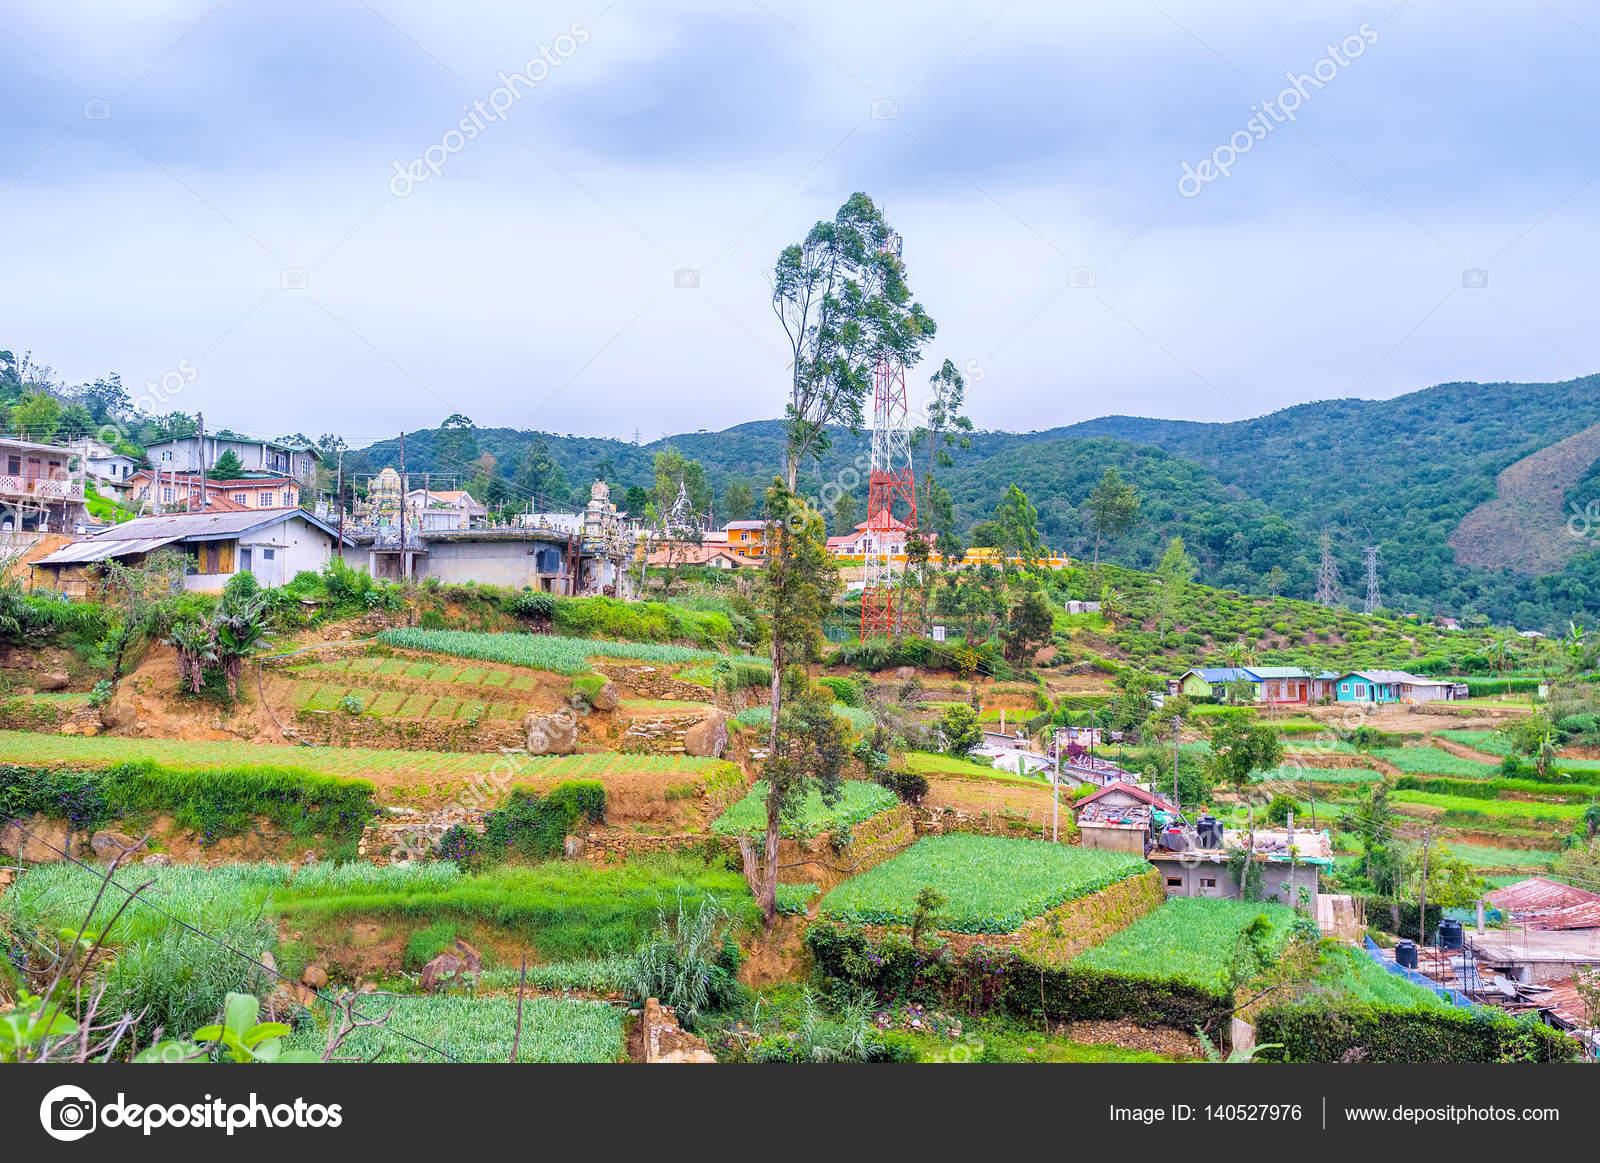 Giardini terrazzati in montagne — Foto Stock © efesenko #140527976